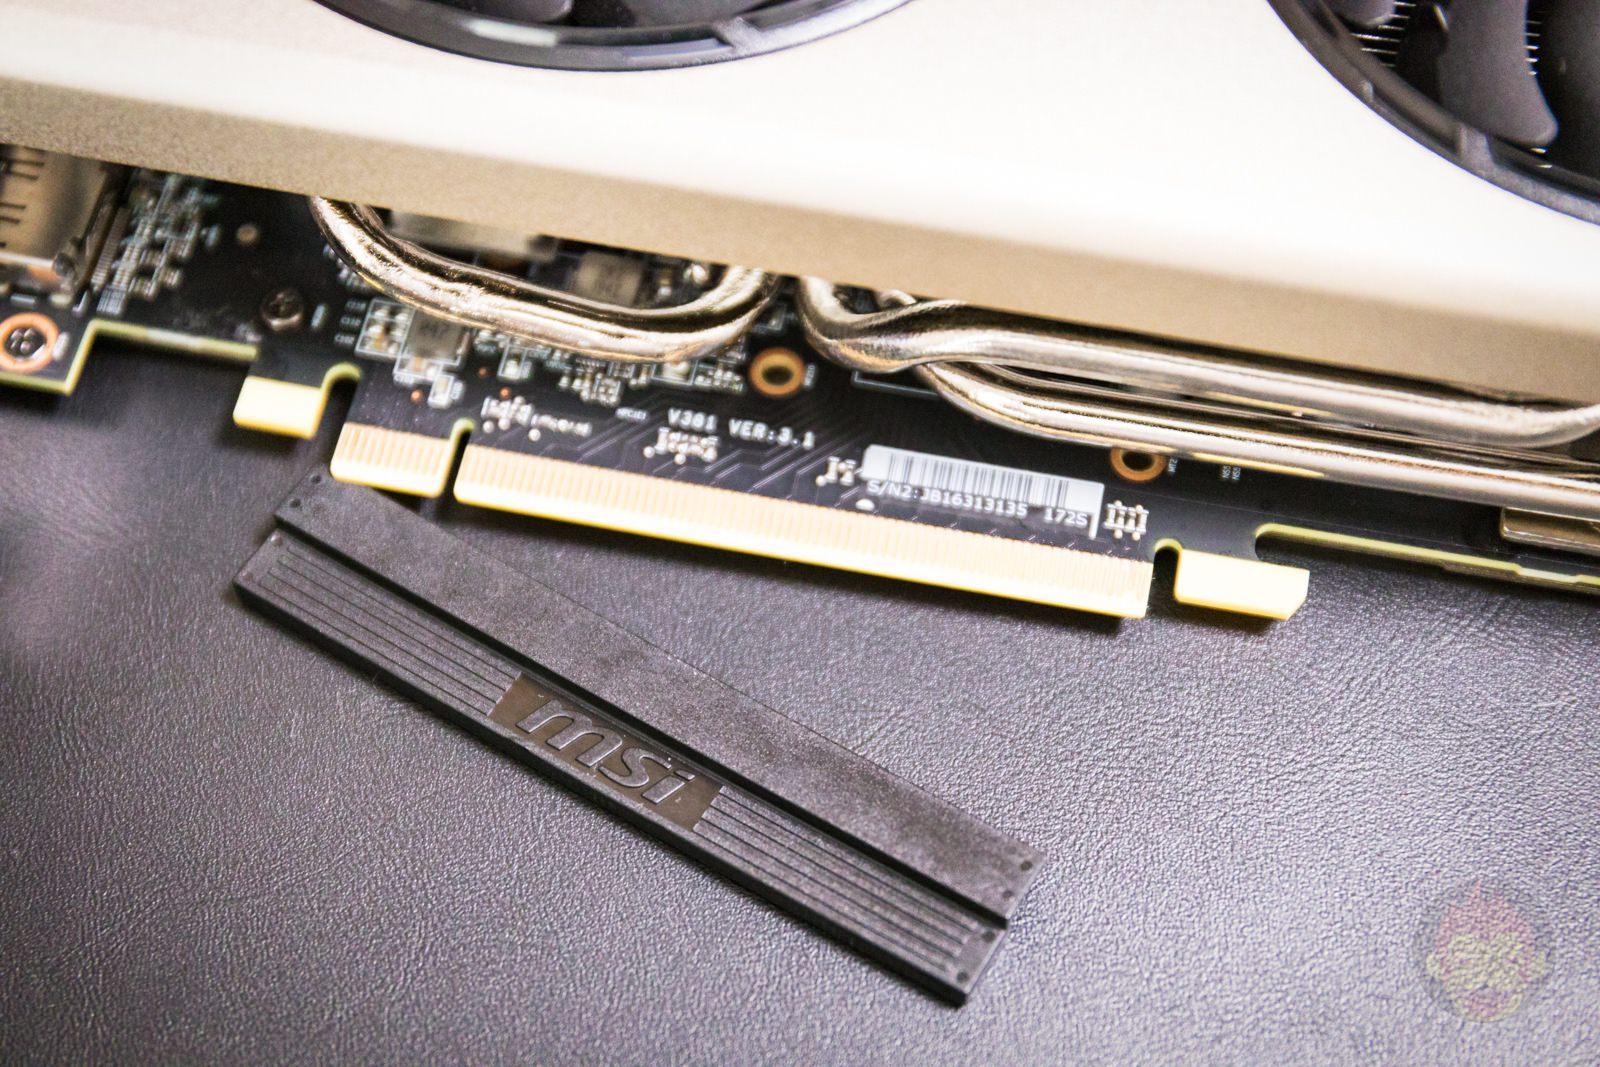 AKiTiO Node Titan with msi AMD Radeon RX 5700 XT Review 17